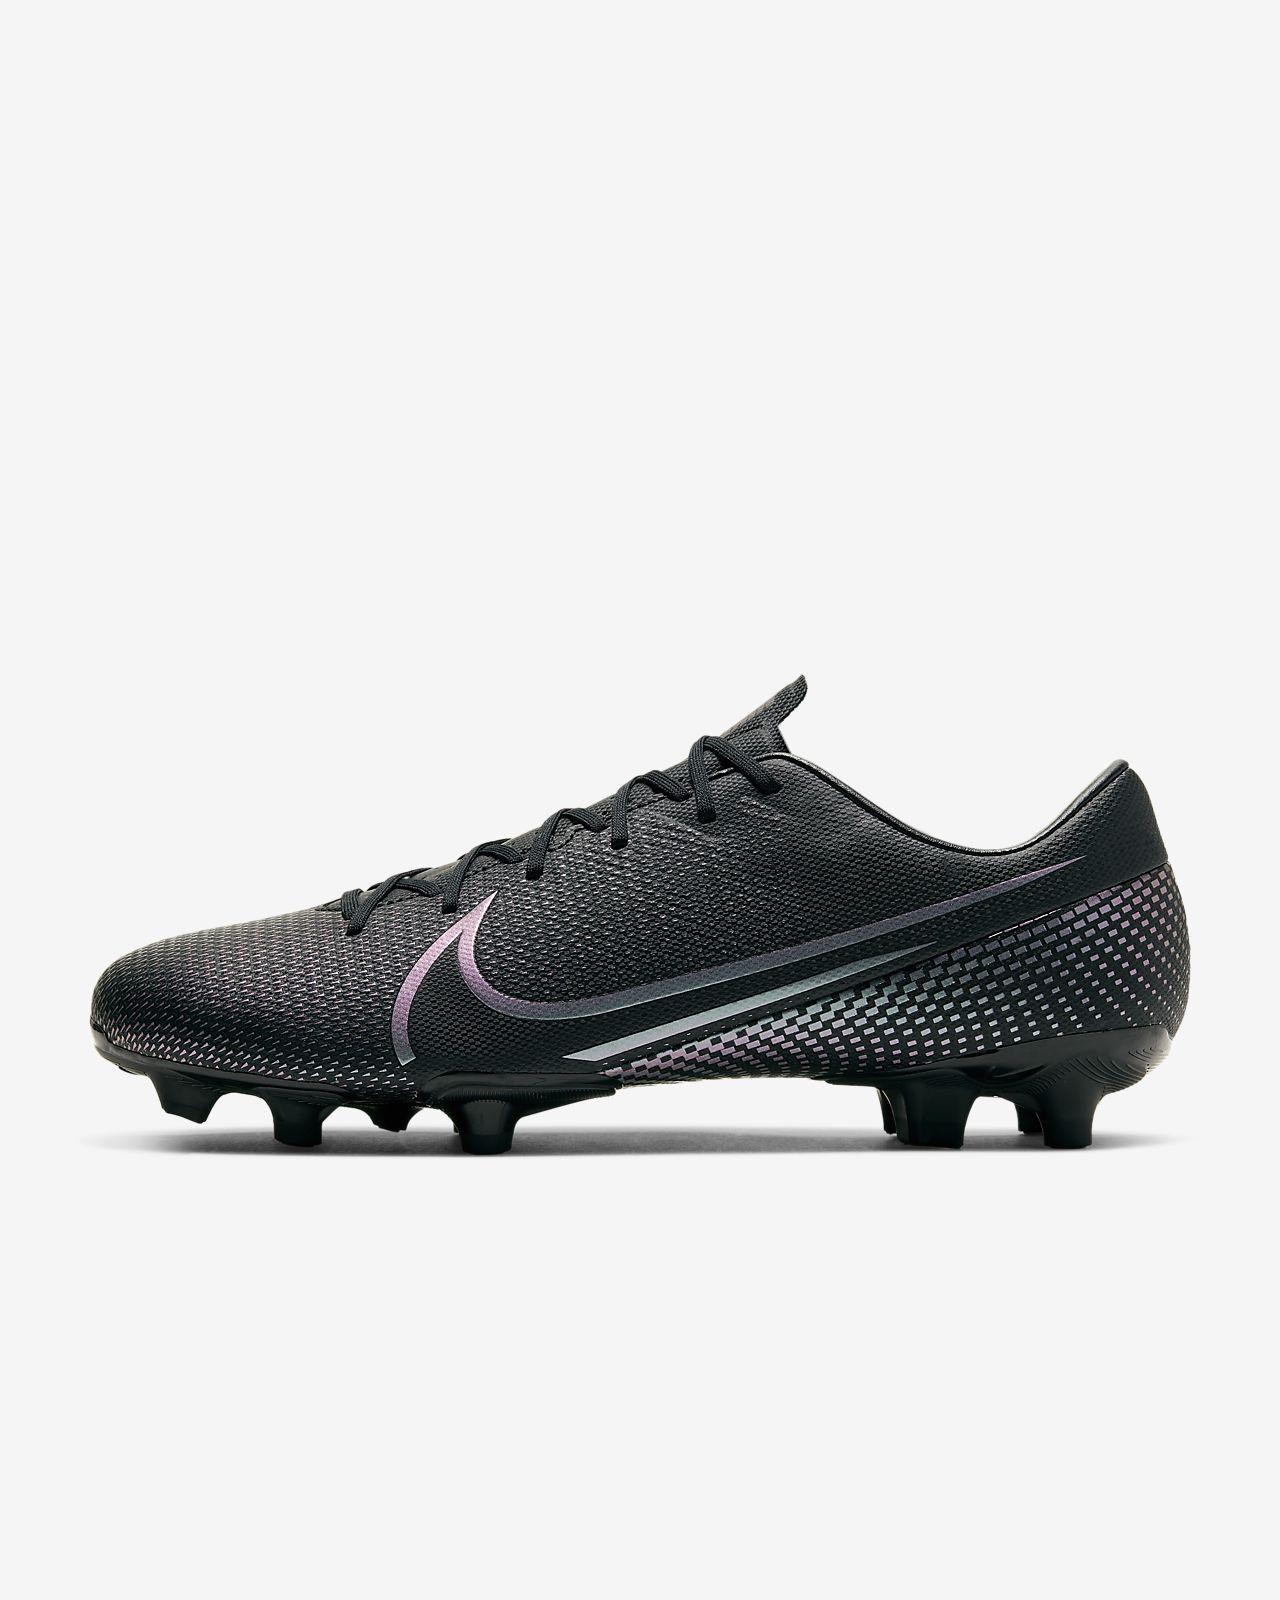 Nike Sports Equipment & Gear | Academy